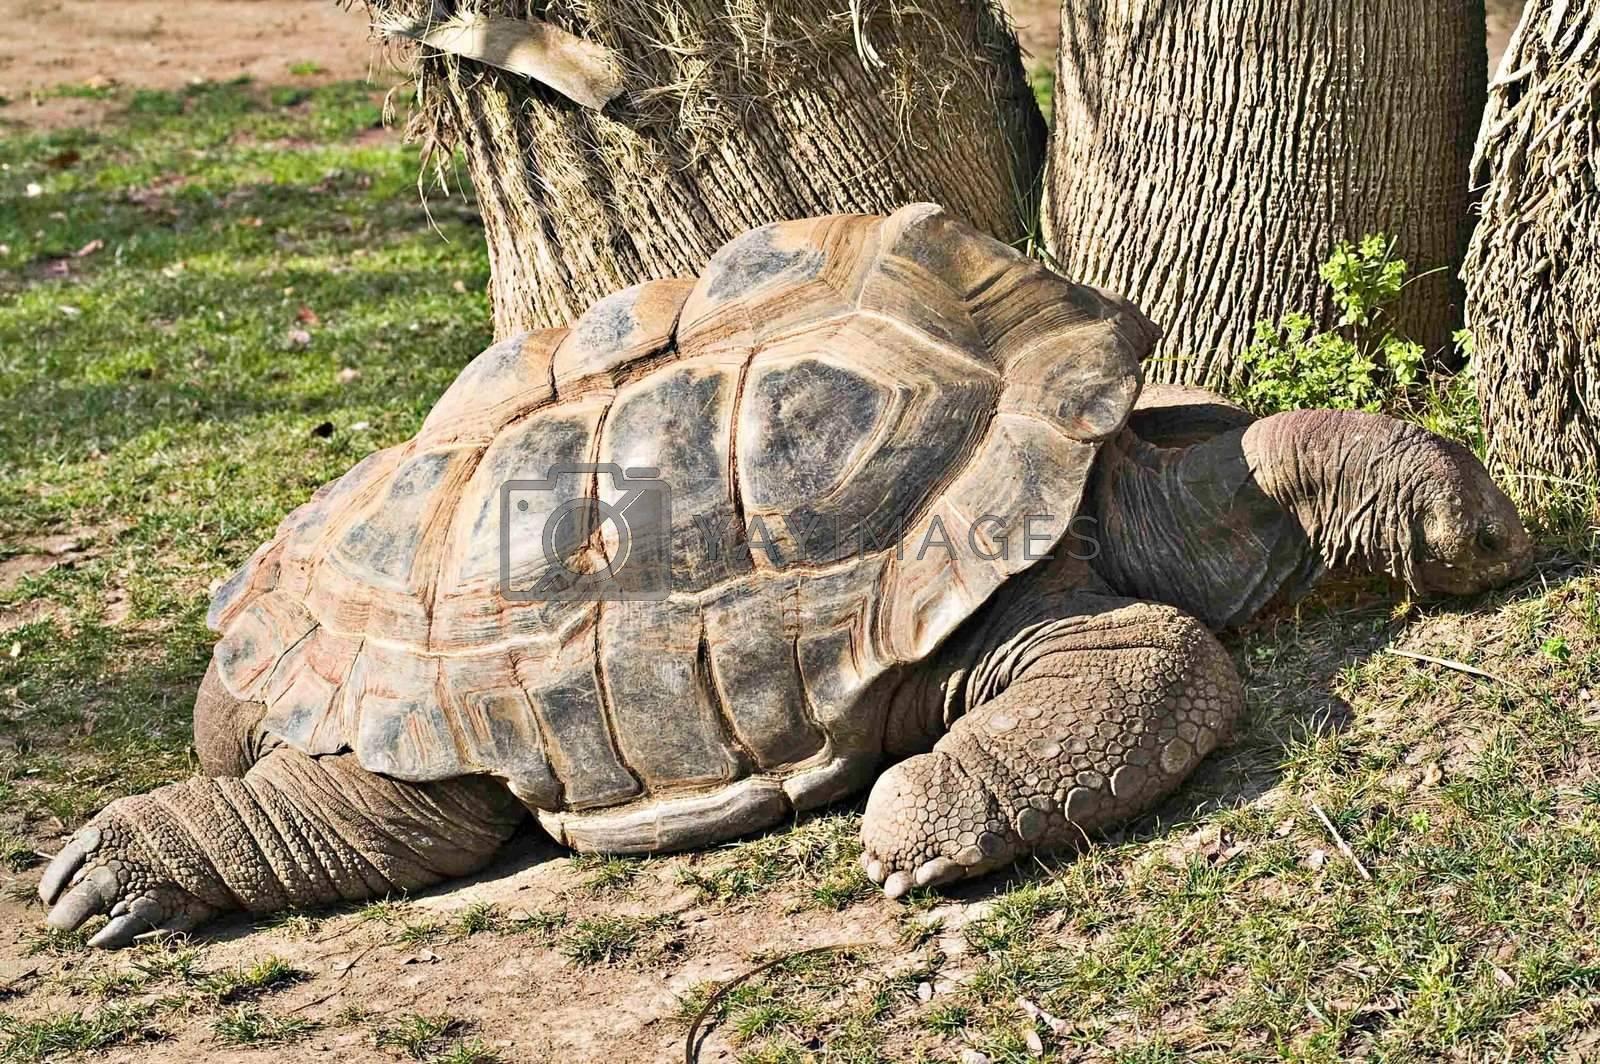 Big turtle at zoo